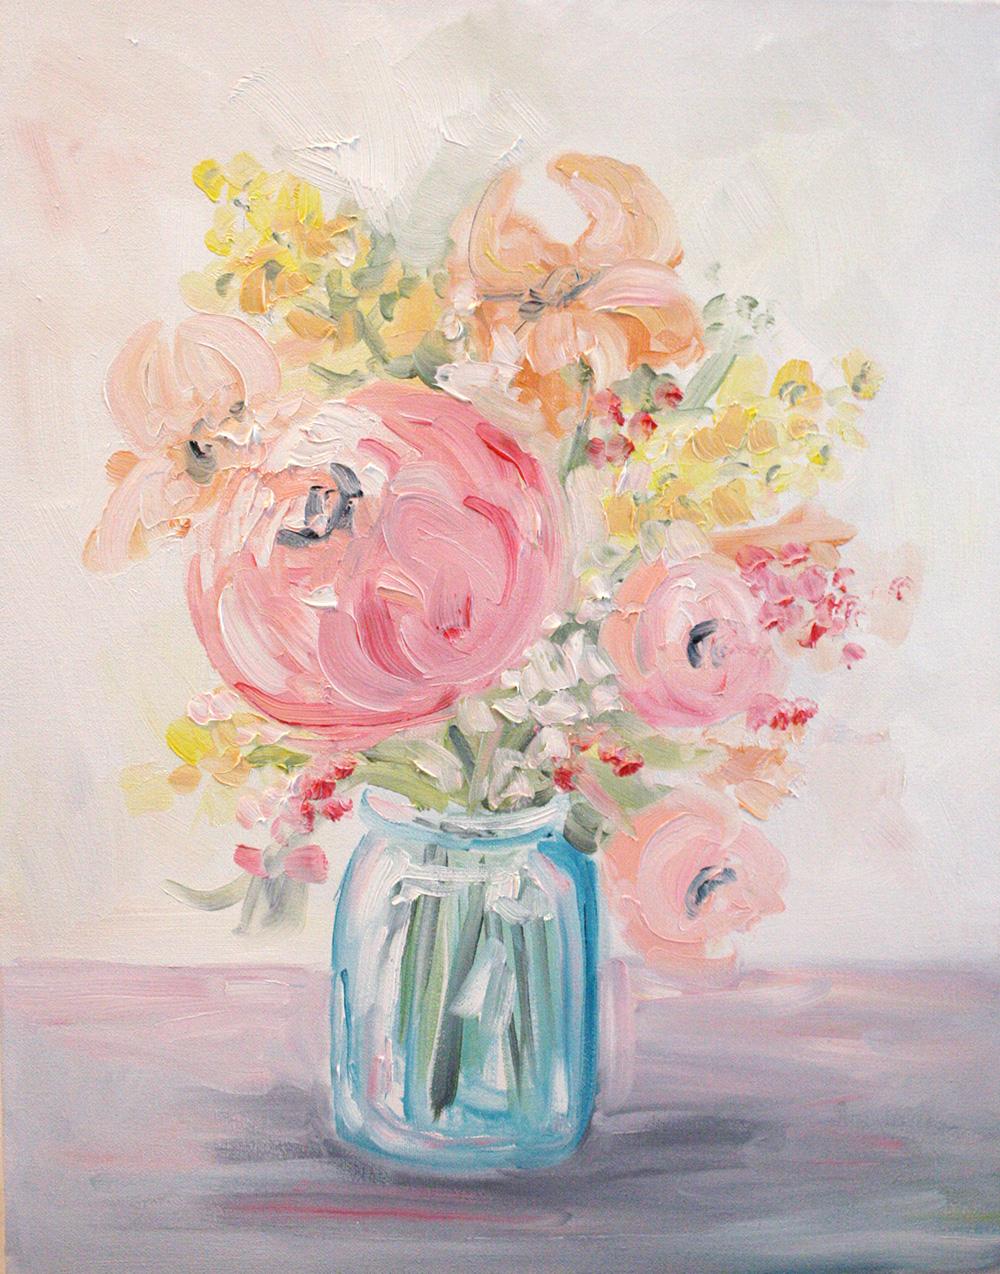 Abstract Floral by Amanda Farquharson.jpg